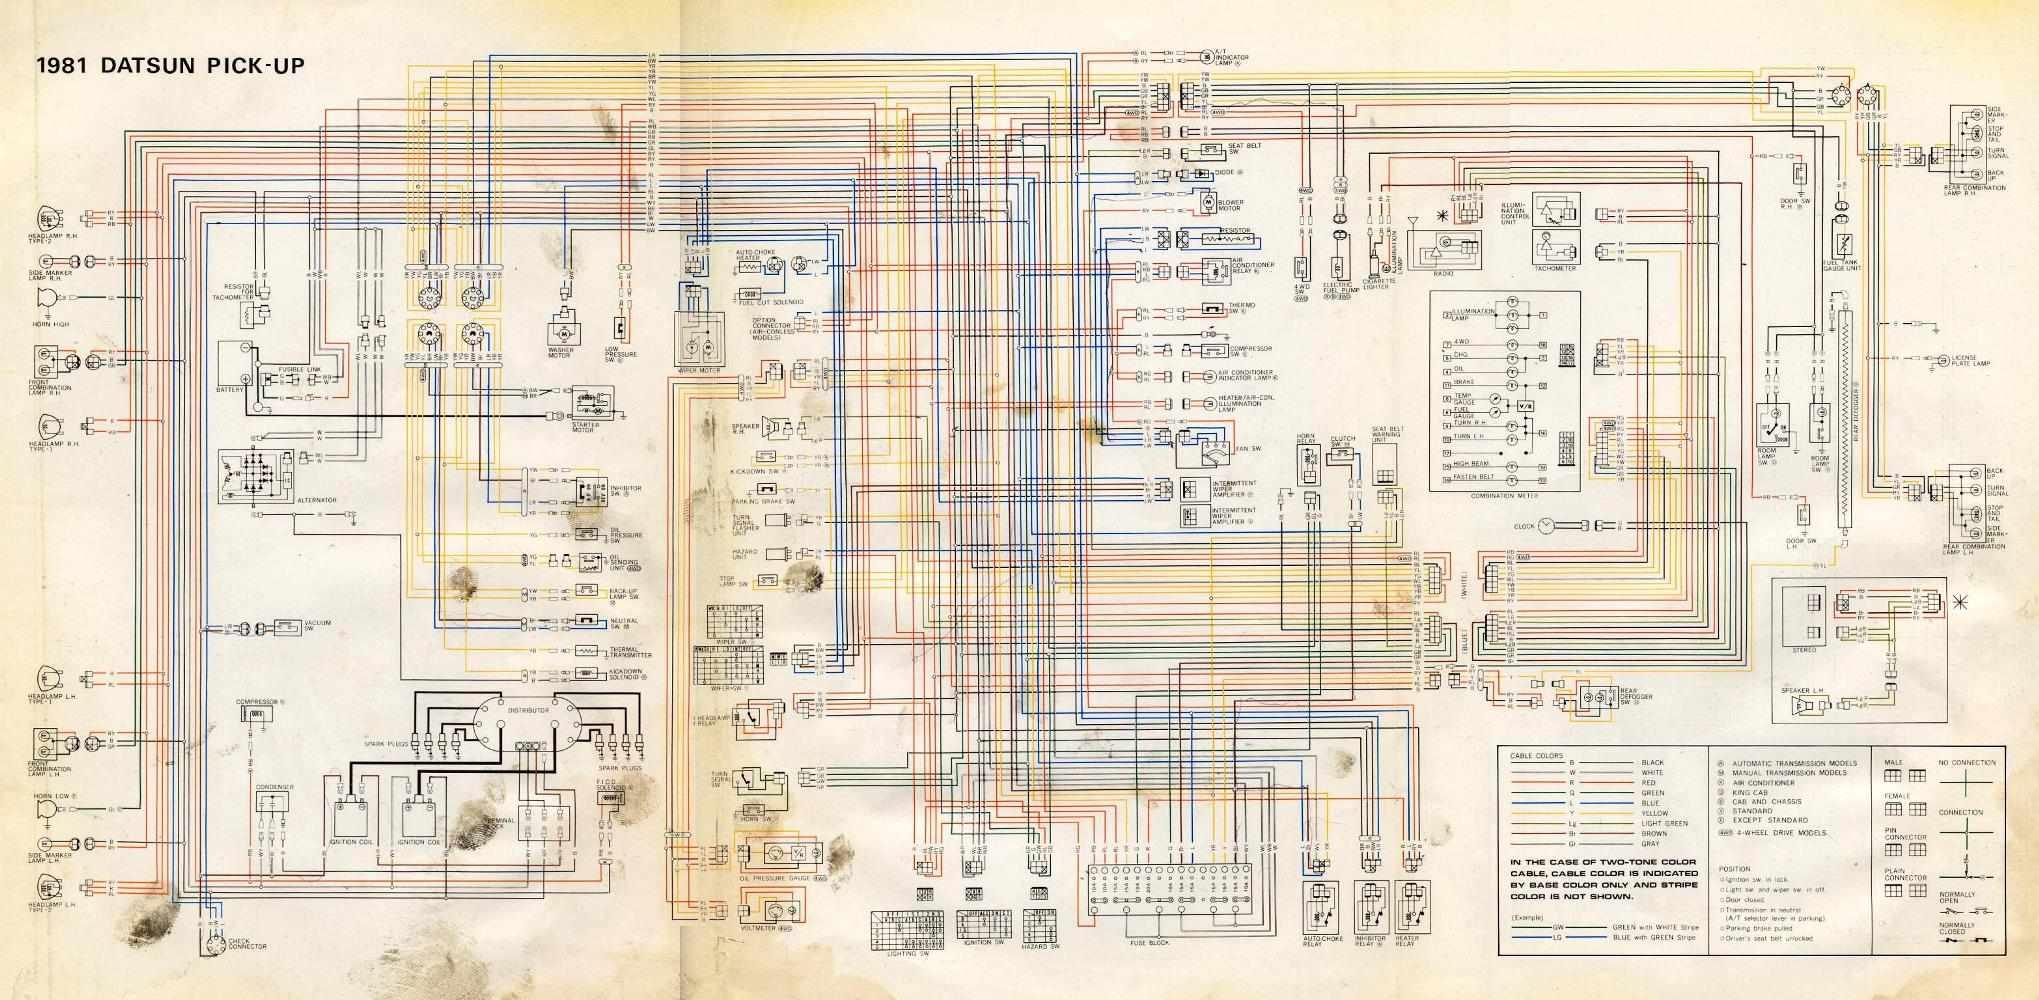 1987 s10 wiper motor wiring diagram wiring library 1978 c10 wiring for wiper electrical wiring diagrams [ 2039 x 1000 Pixel ]